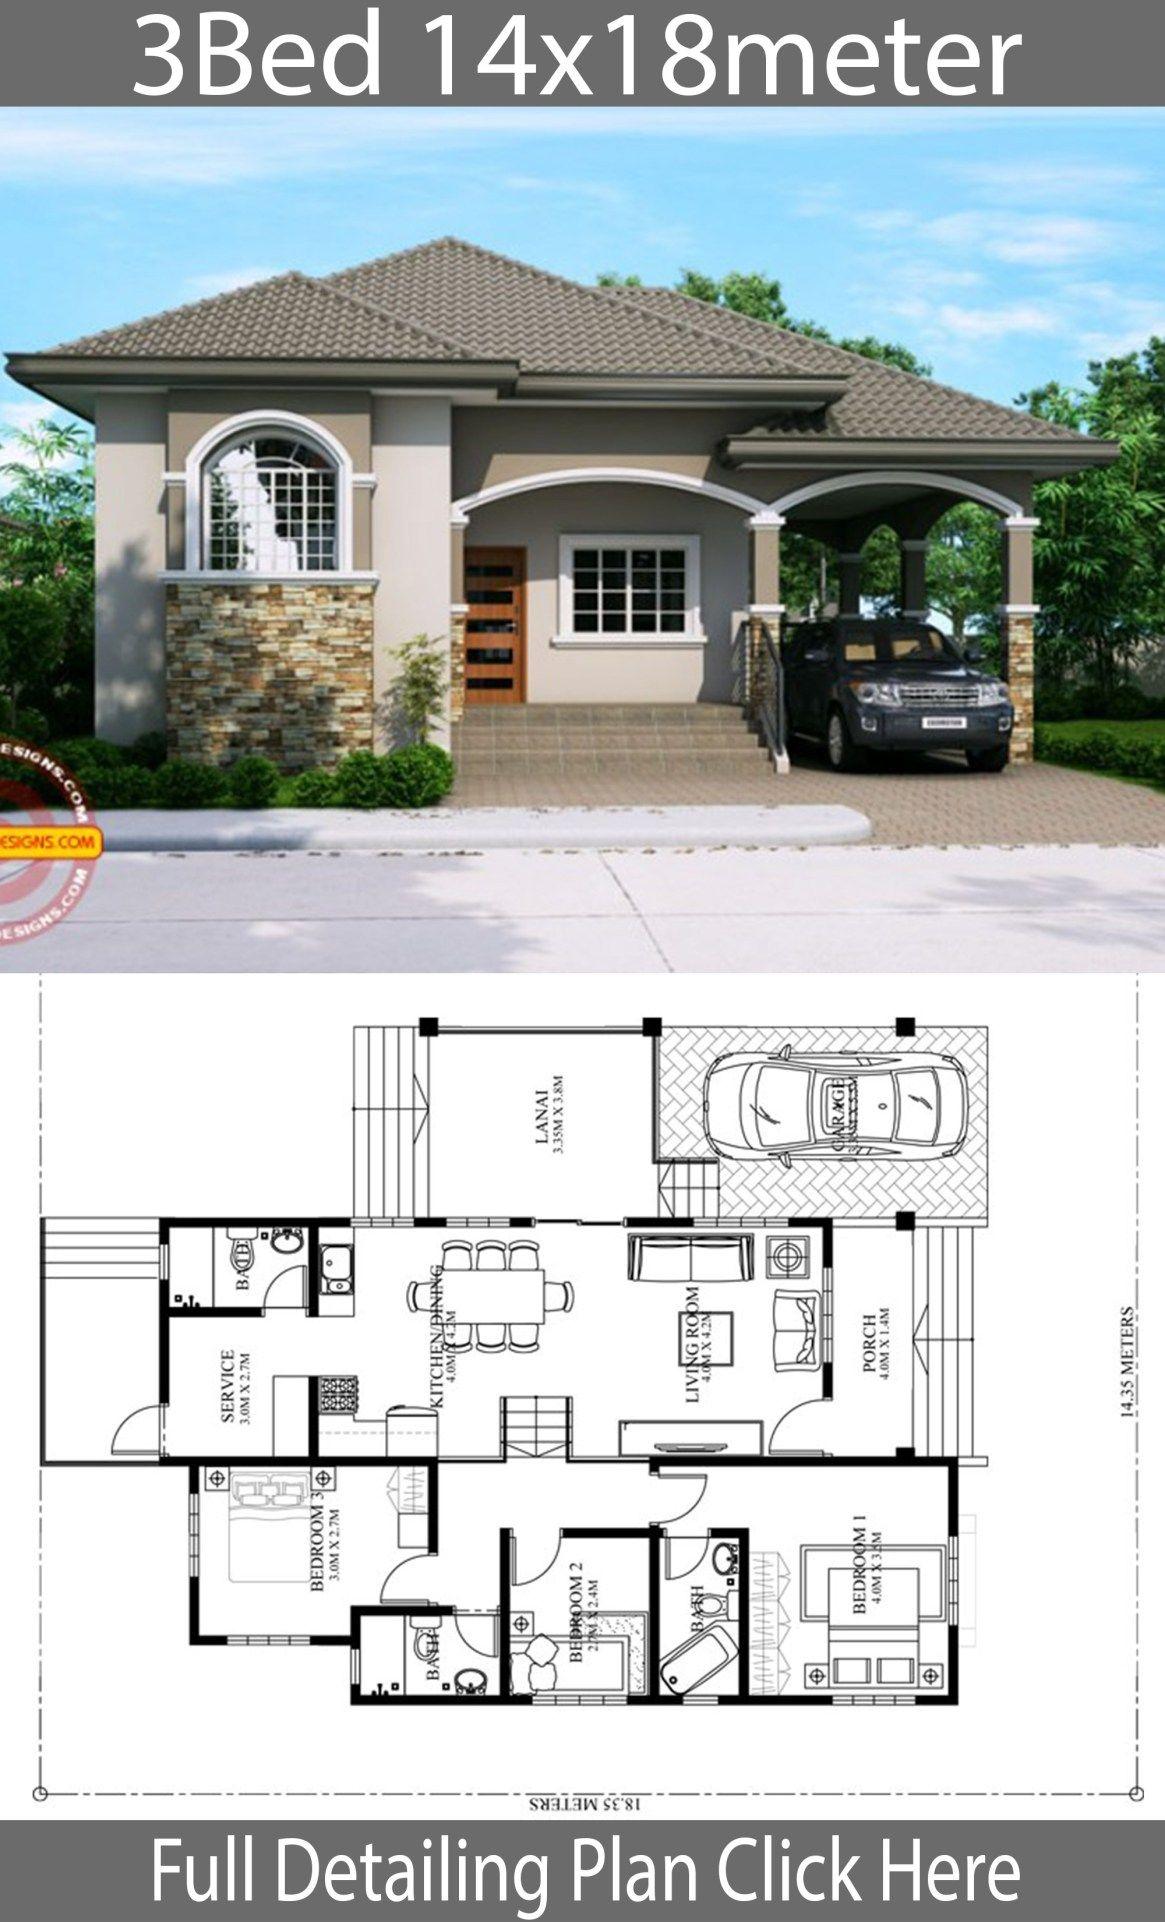 Home Design Plan 14x18m With 3 Bedrooms Planos De Casas